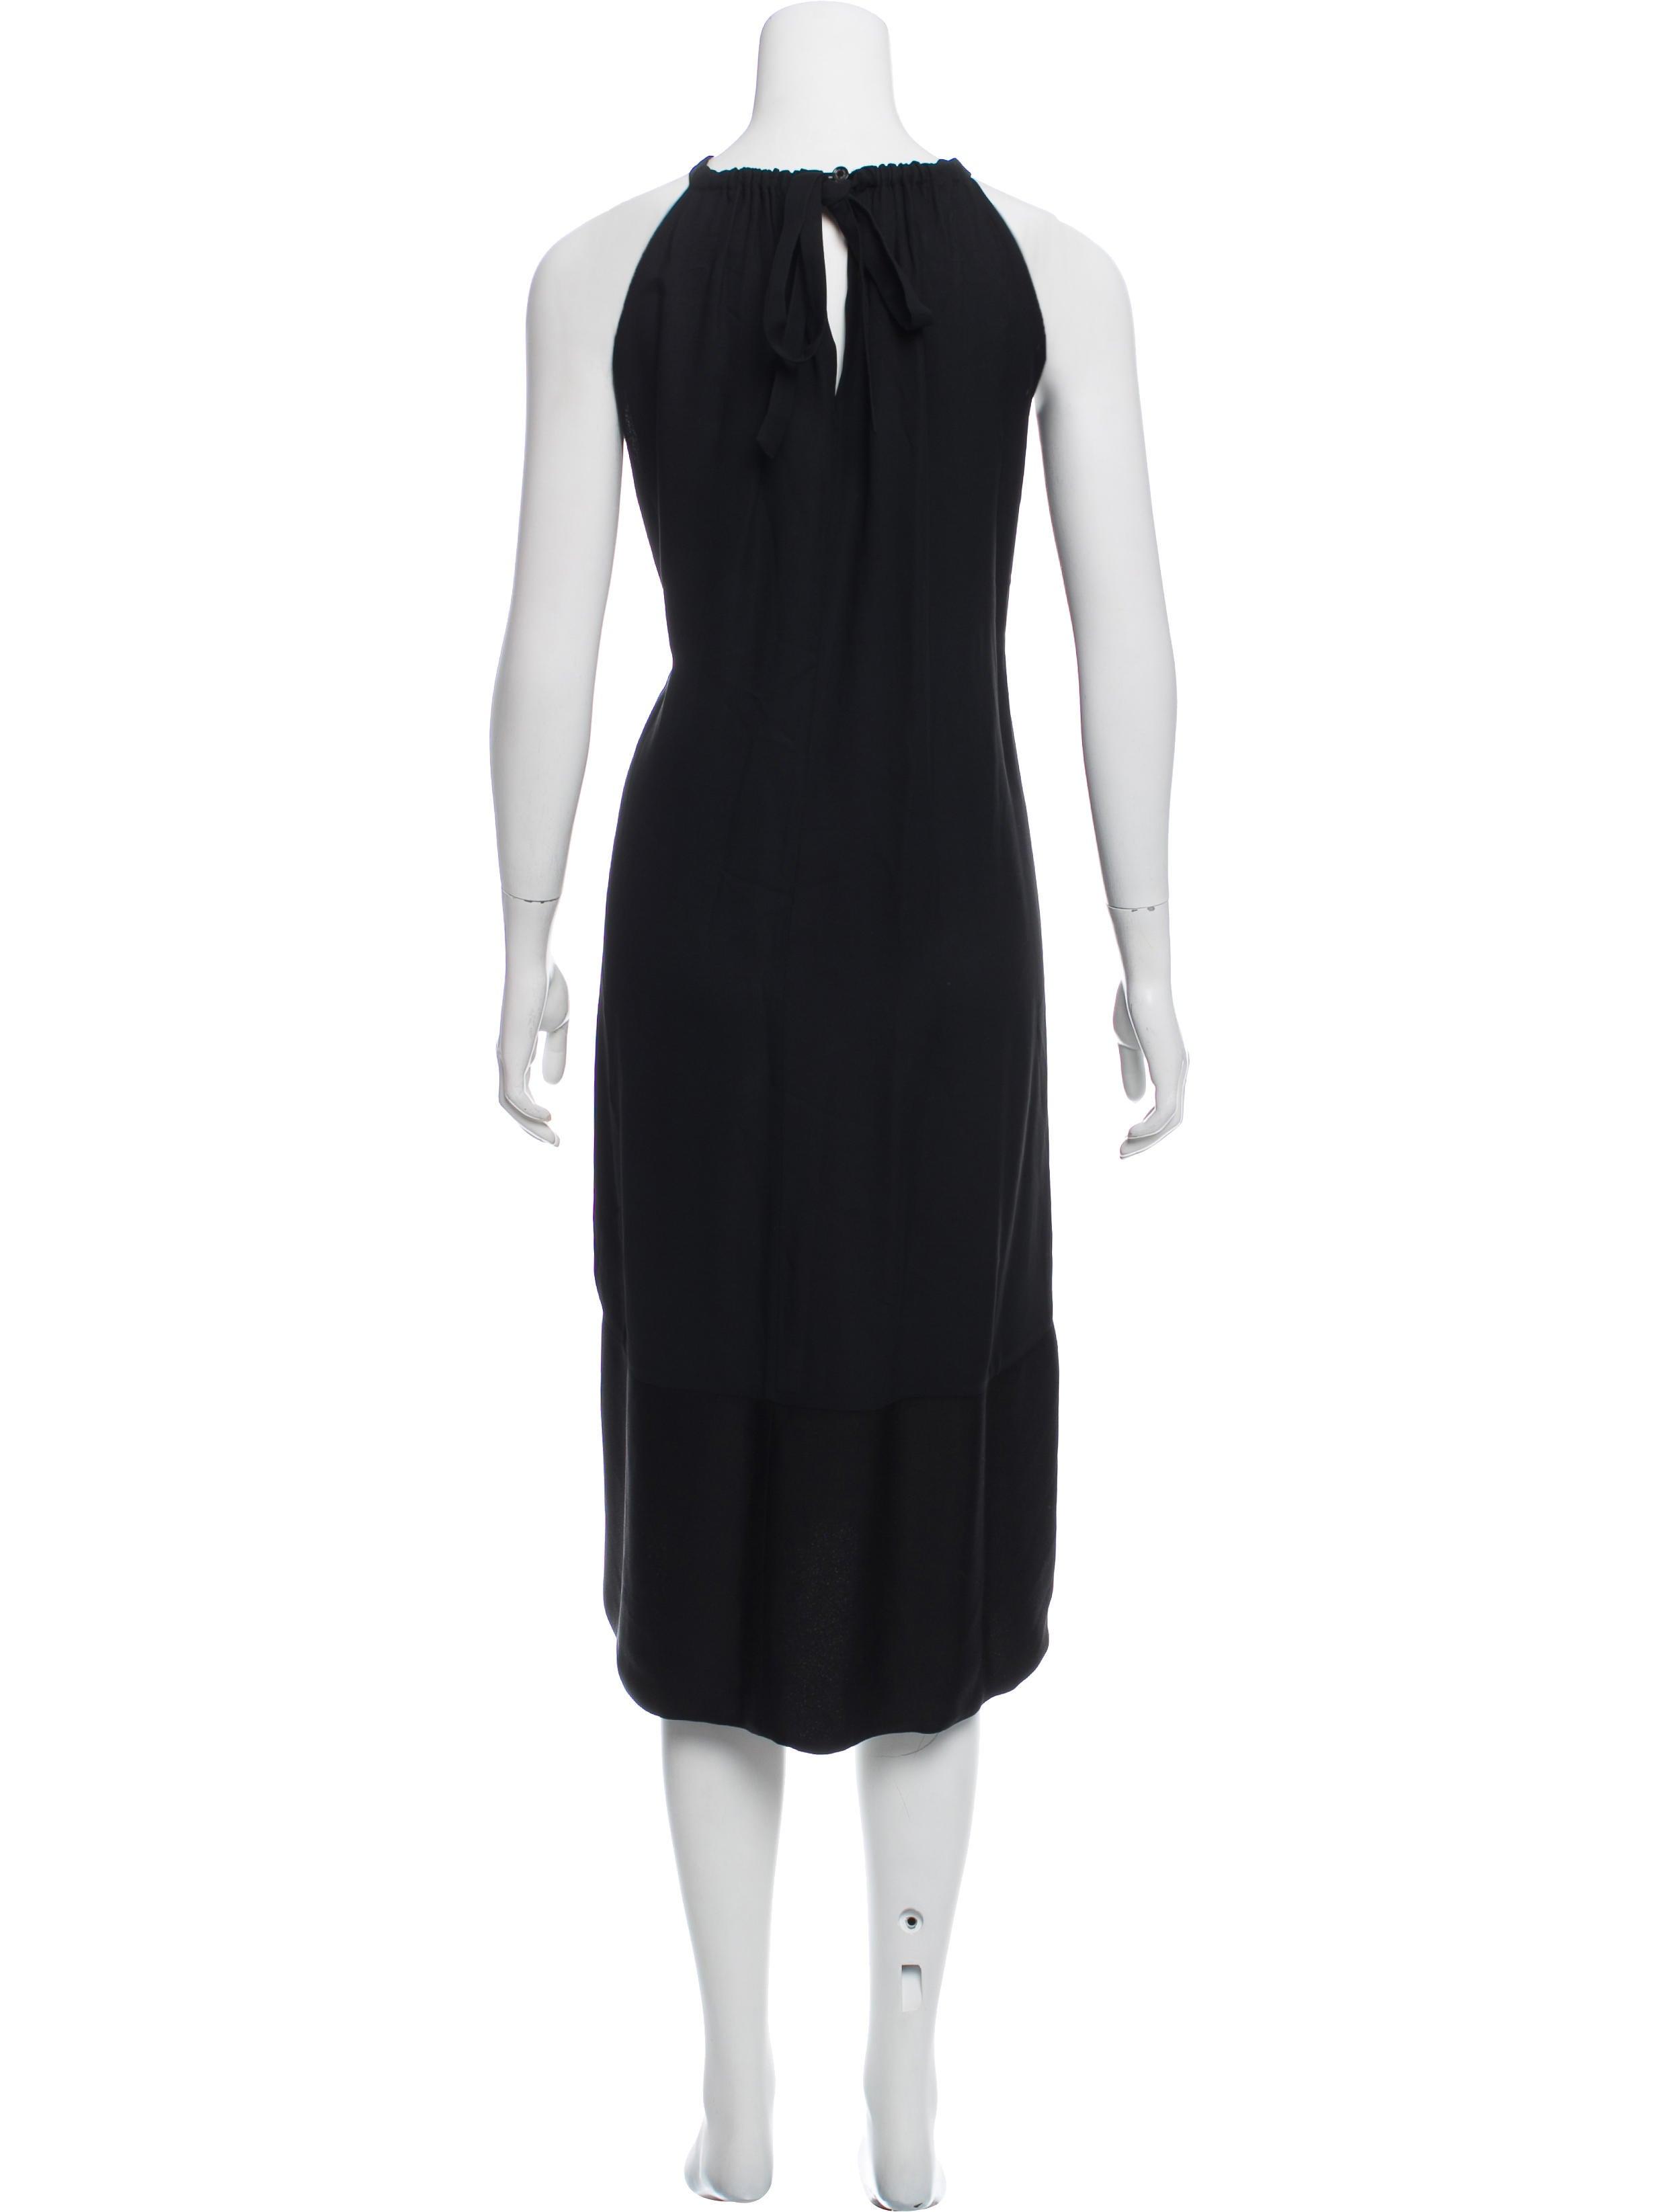 Kate Spade New York Sleeveless Midi Dress Clothing